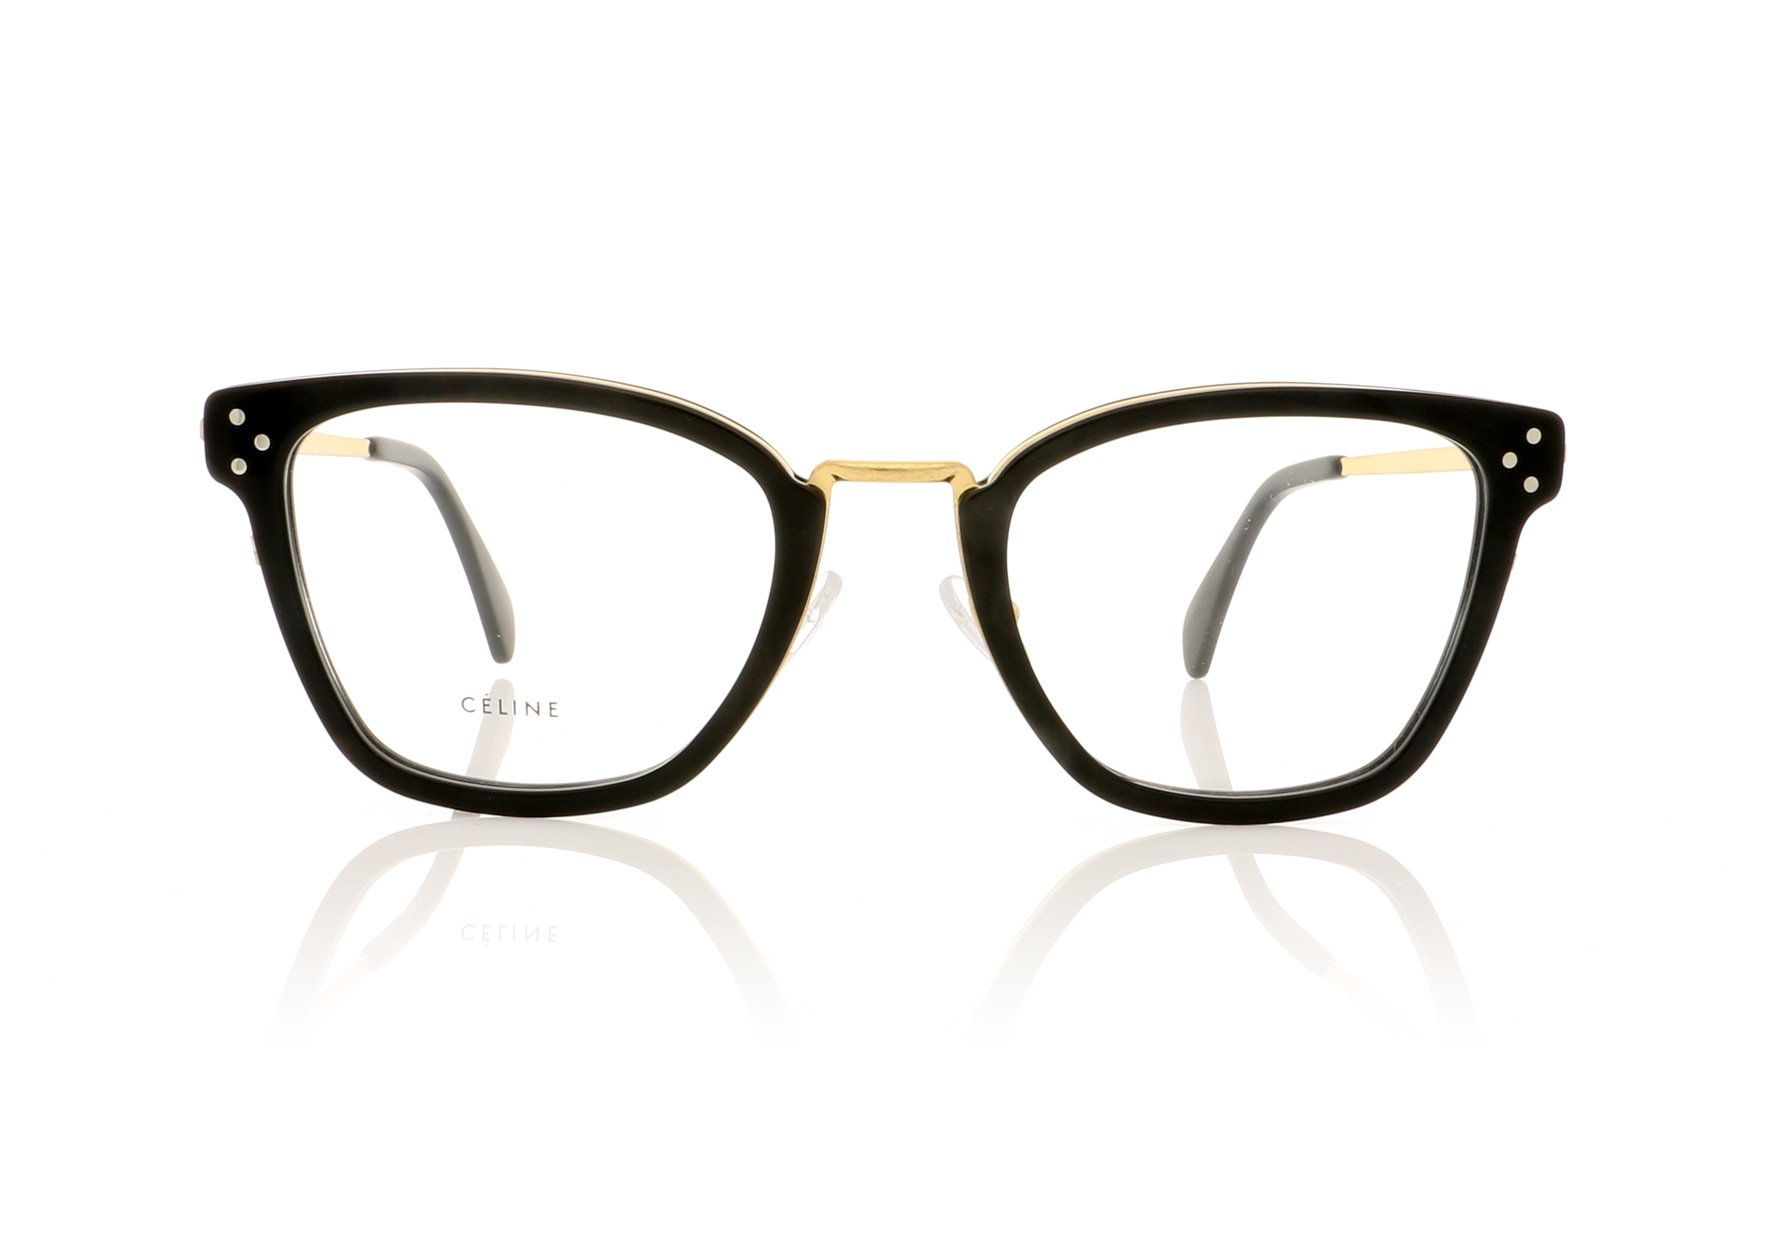 CELINE- CL50002U Opticals  £360 (Sold out)  COLOUR Black/Gold  CATEGORY Opticals  MATERIAL Metal  SHAPE Rectangular